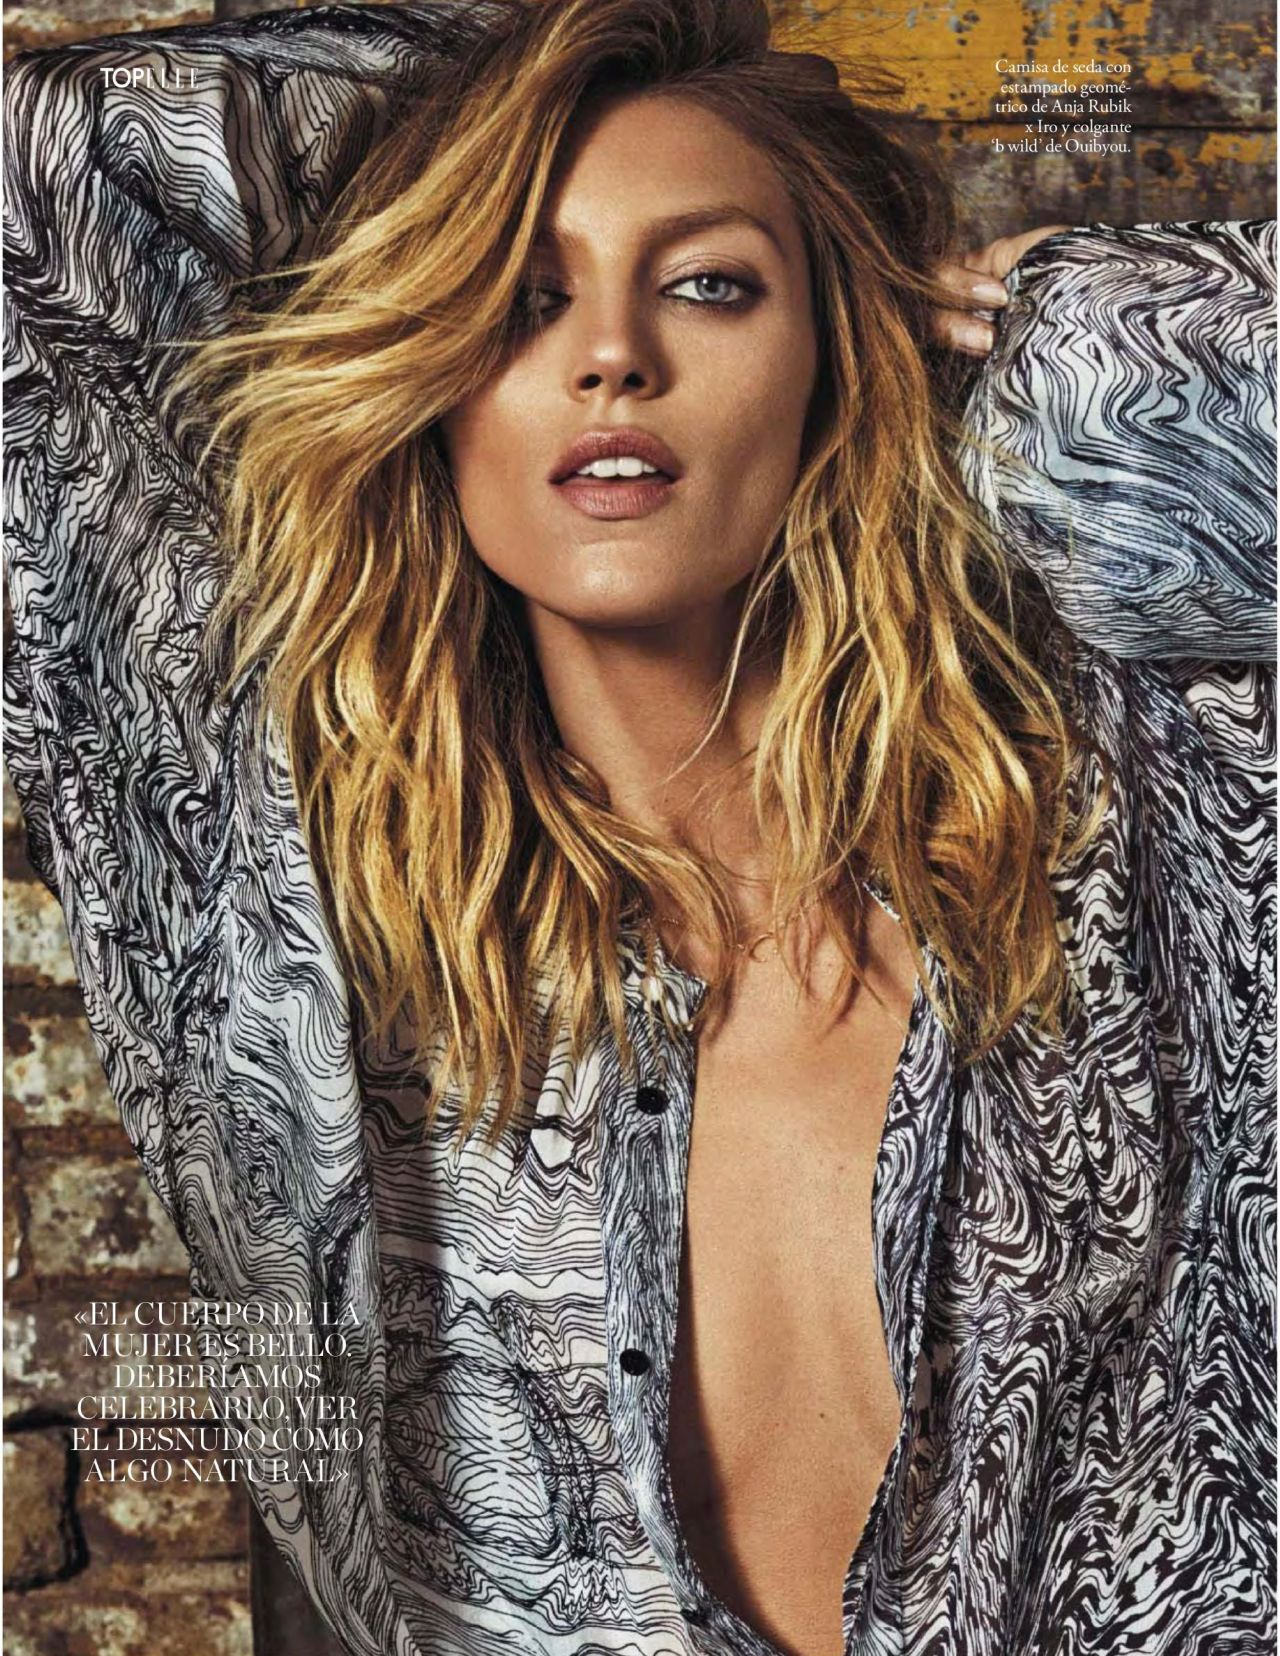 Anja Rubik – 'Modelo de Diseno' Elle España July 2016 Issue